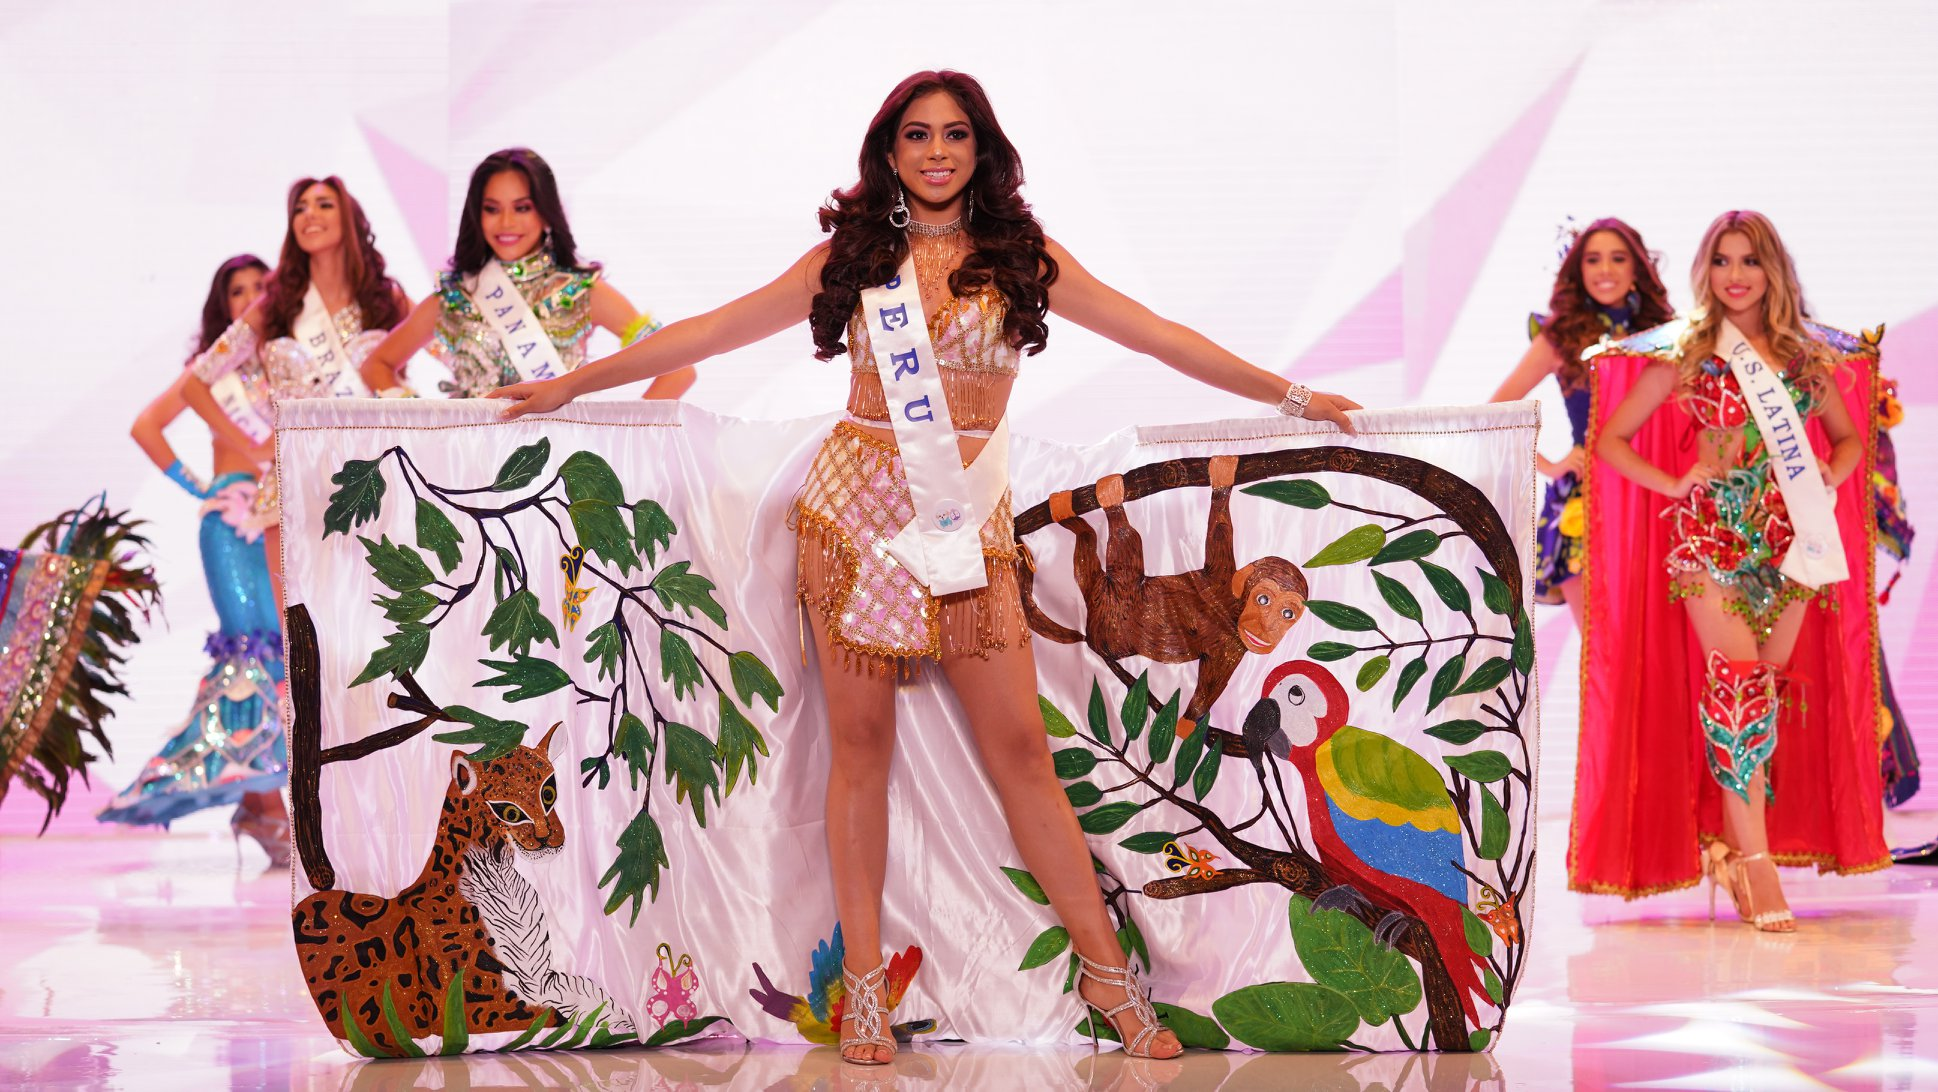 romina lopez, top 12 de miss teen mundial 2019. - Página 4 61420110